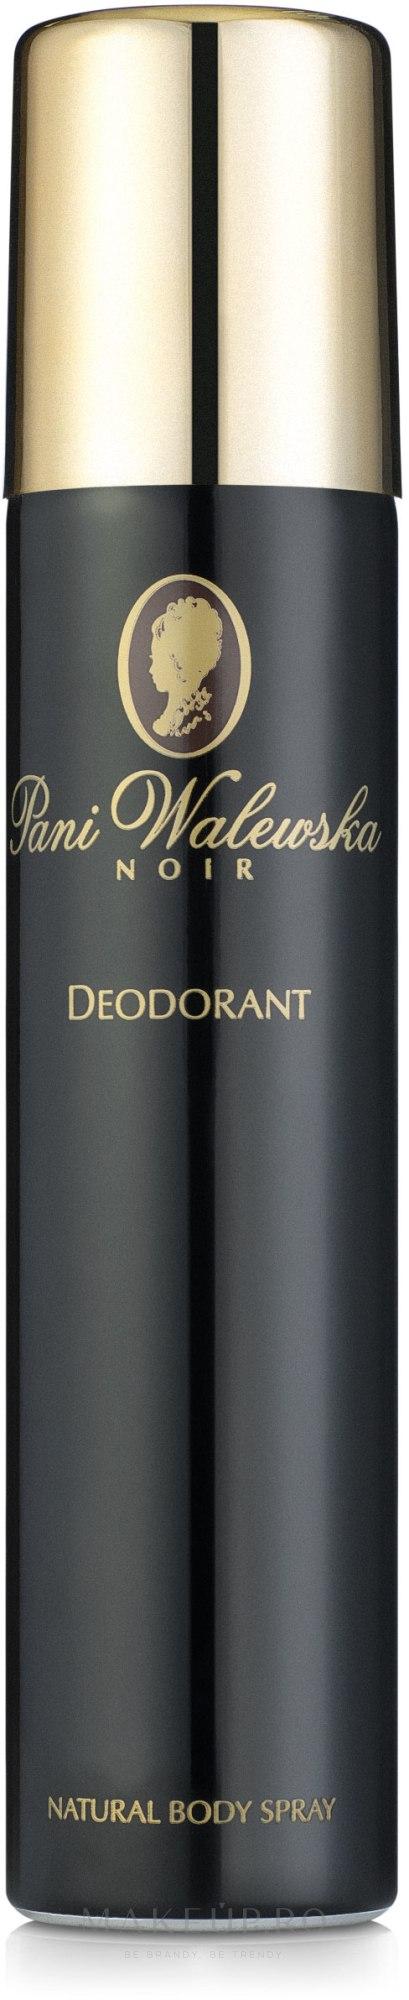 Pani Walewska Noir - Deodorant — Imagine 90 ml